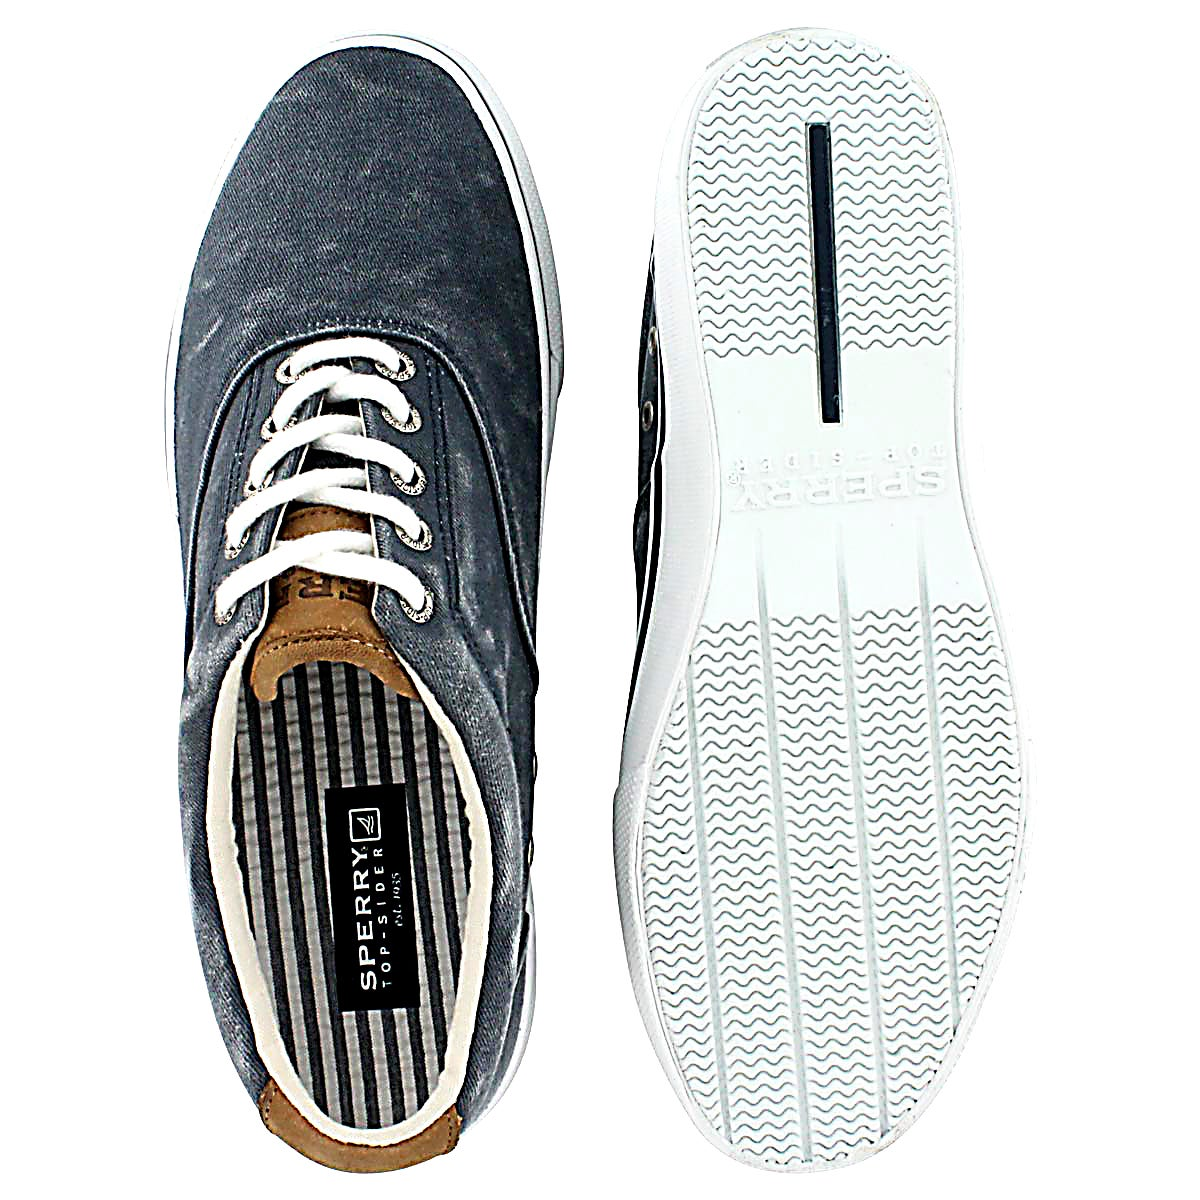 Mns Striper CVO navy sneaker